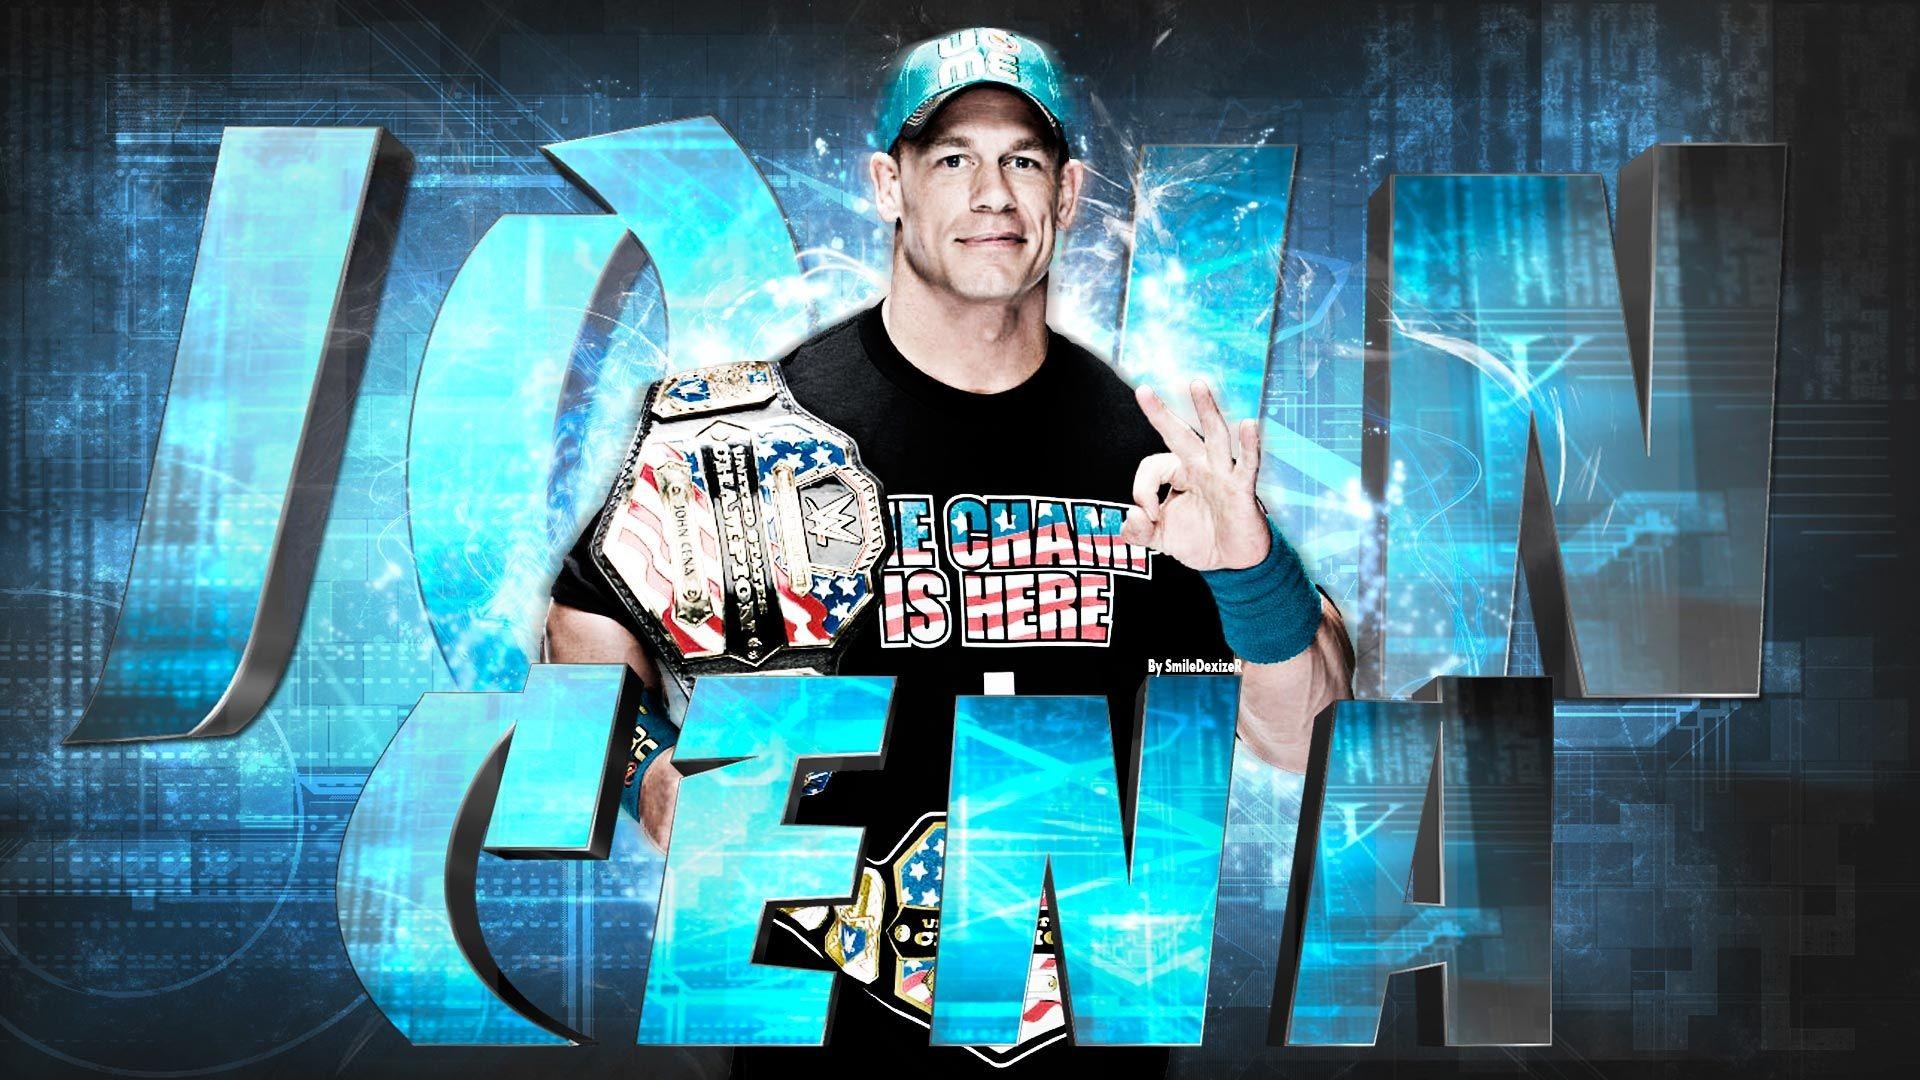 … WWE John Cena Wallpapers 2016 HD